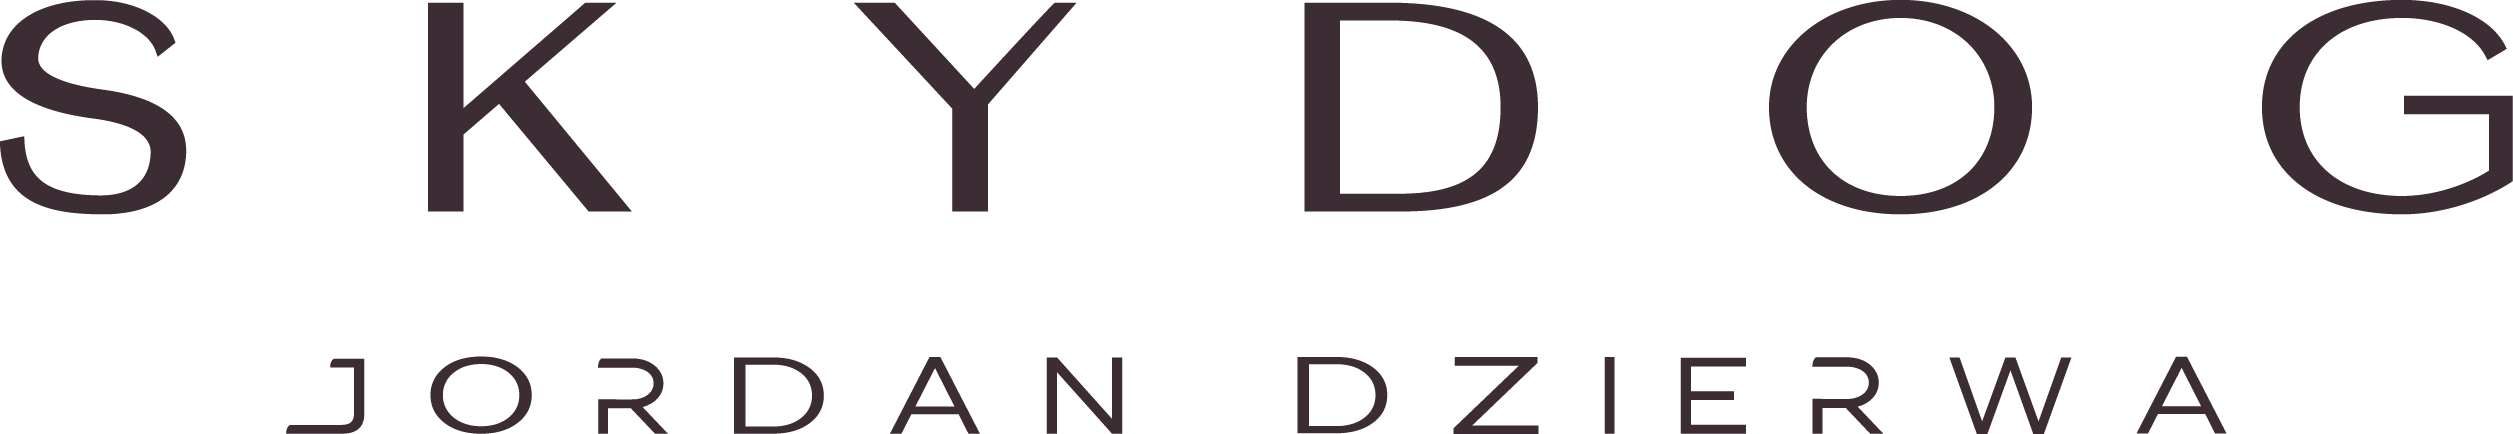 Jewelry Designer Looking for Identity/Logo